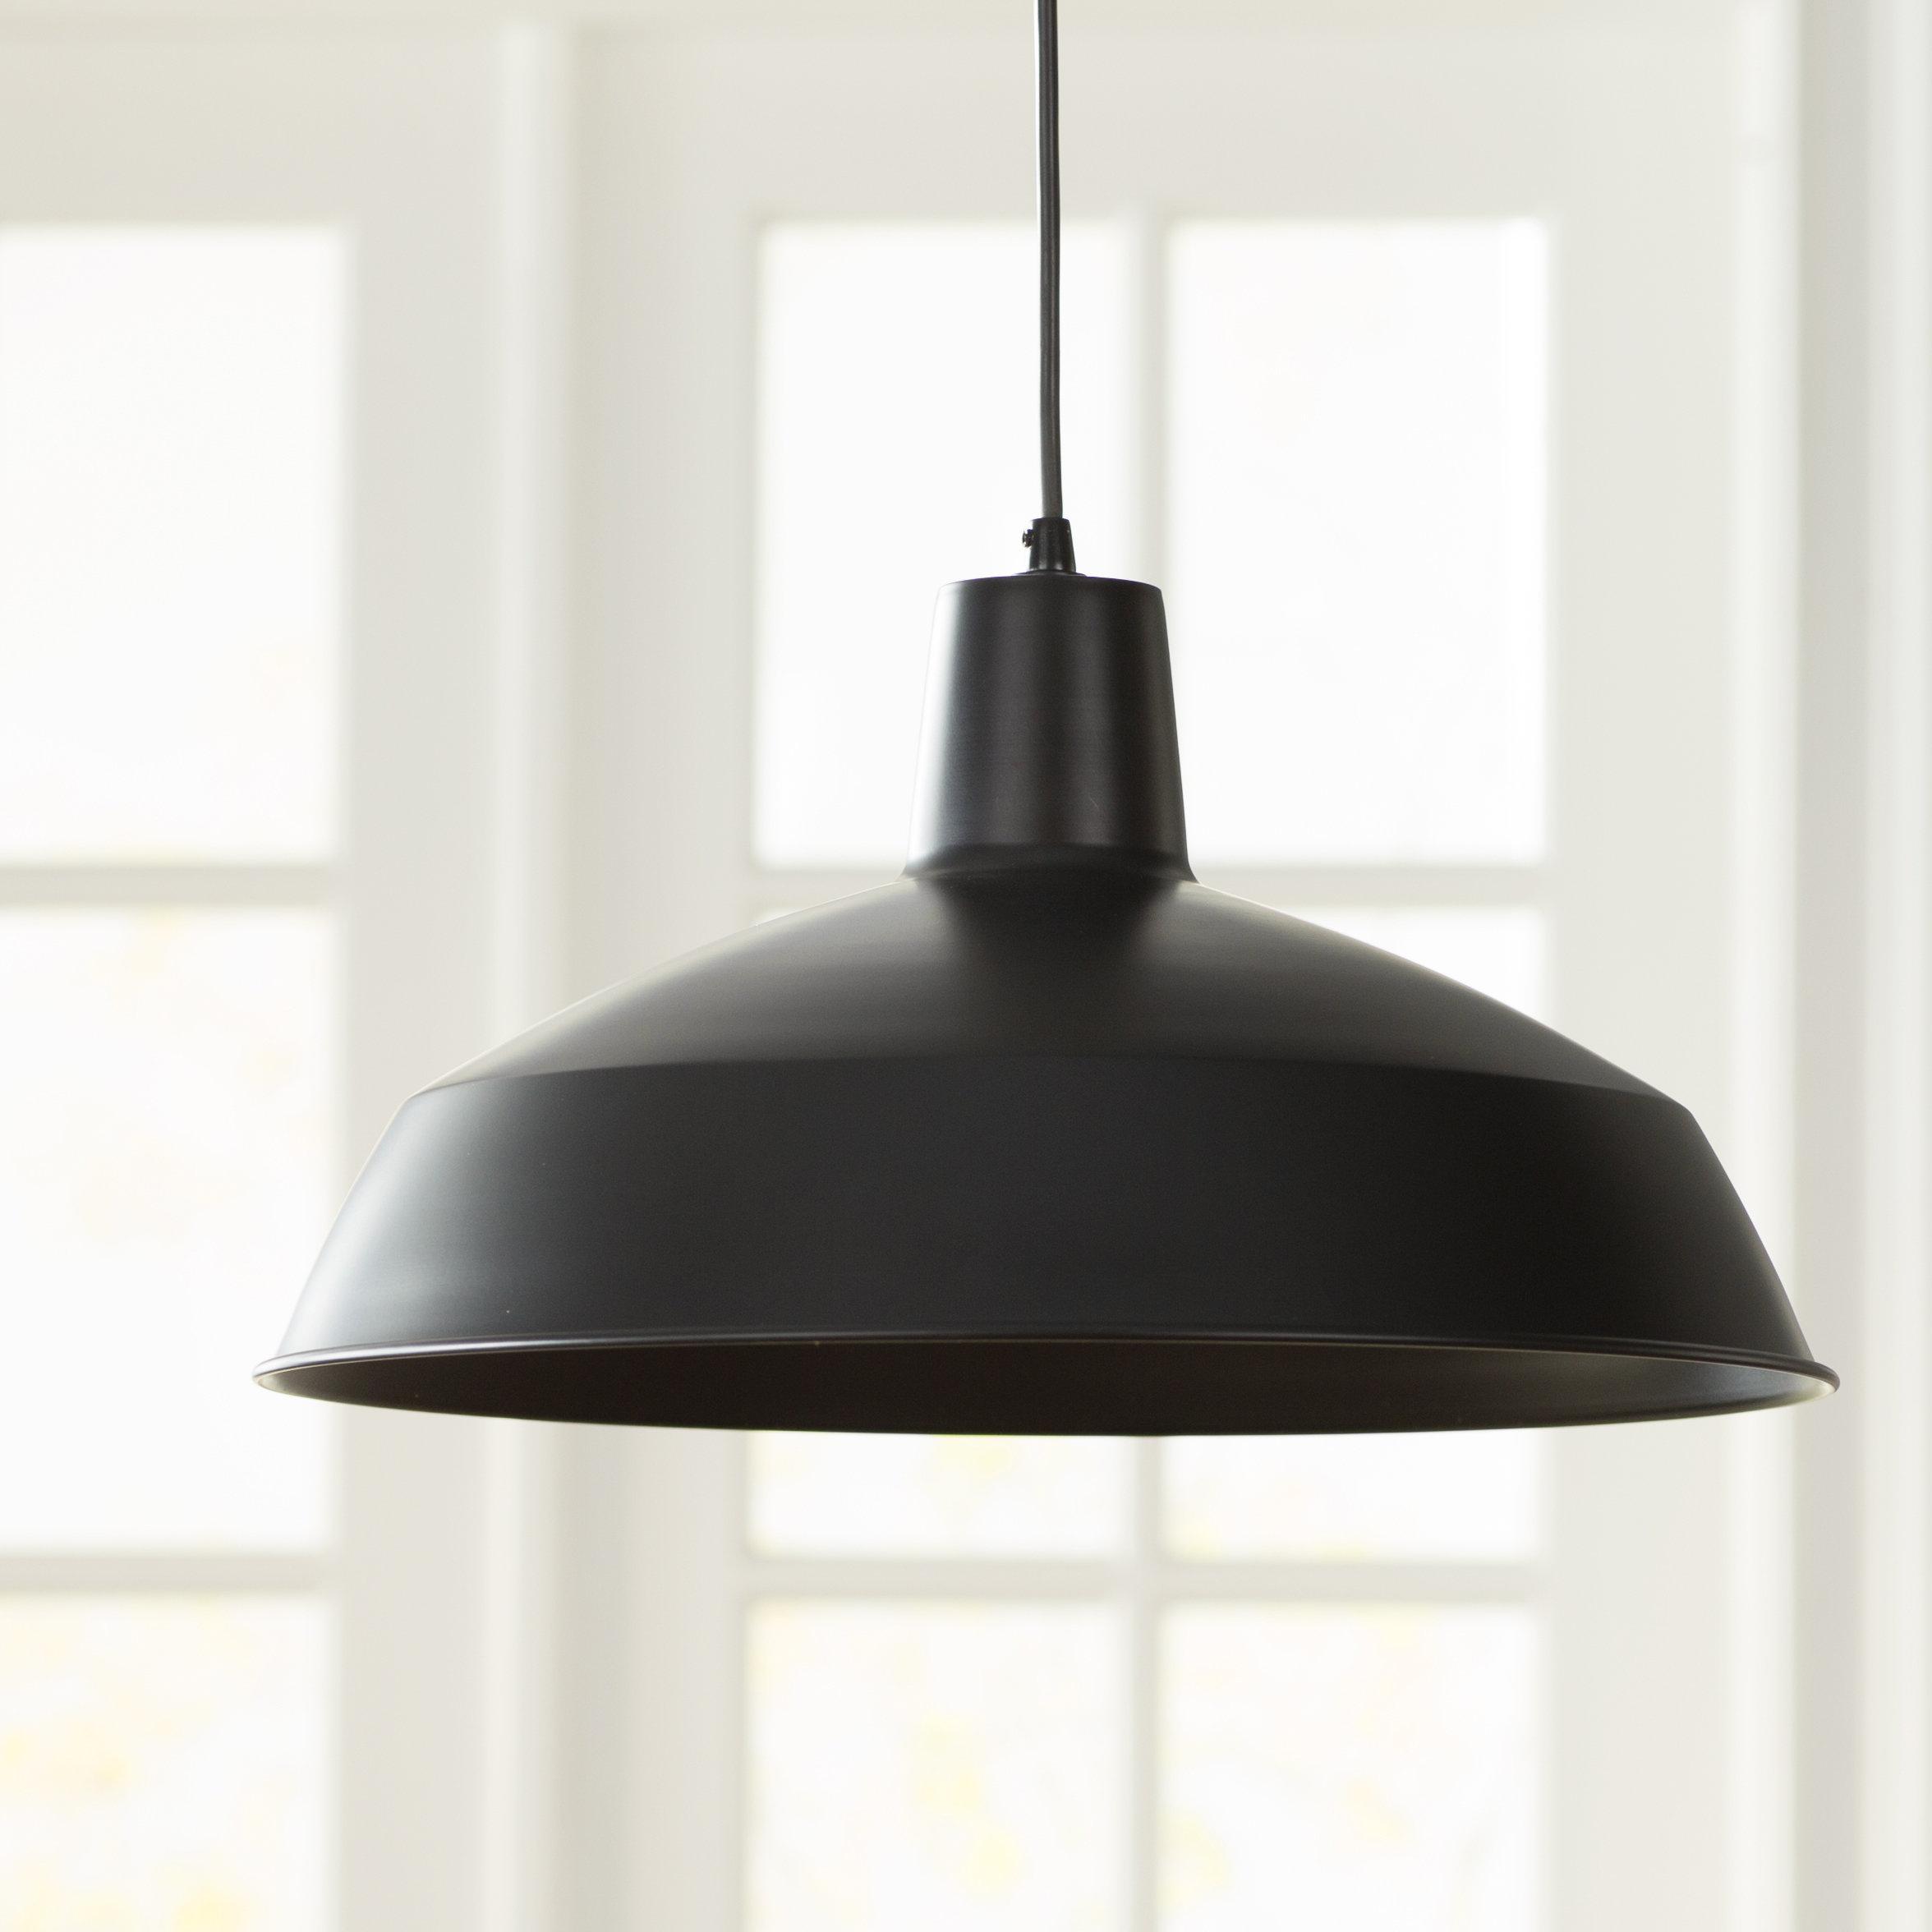 2019 Adrianna 1 Light Single Dome Pendant Within Vintage Edison 1 Light Bowl Pendants (View 1 of 25)